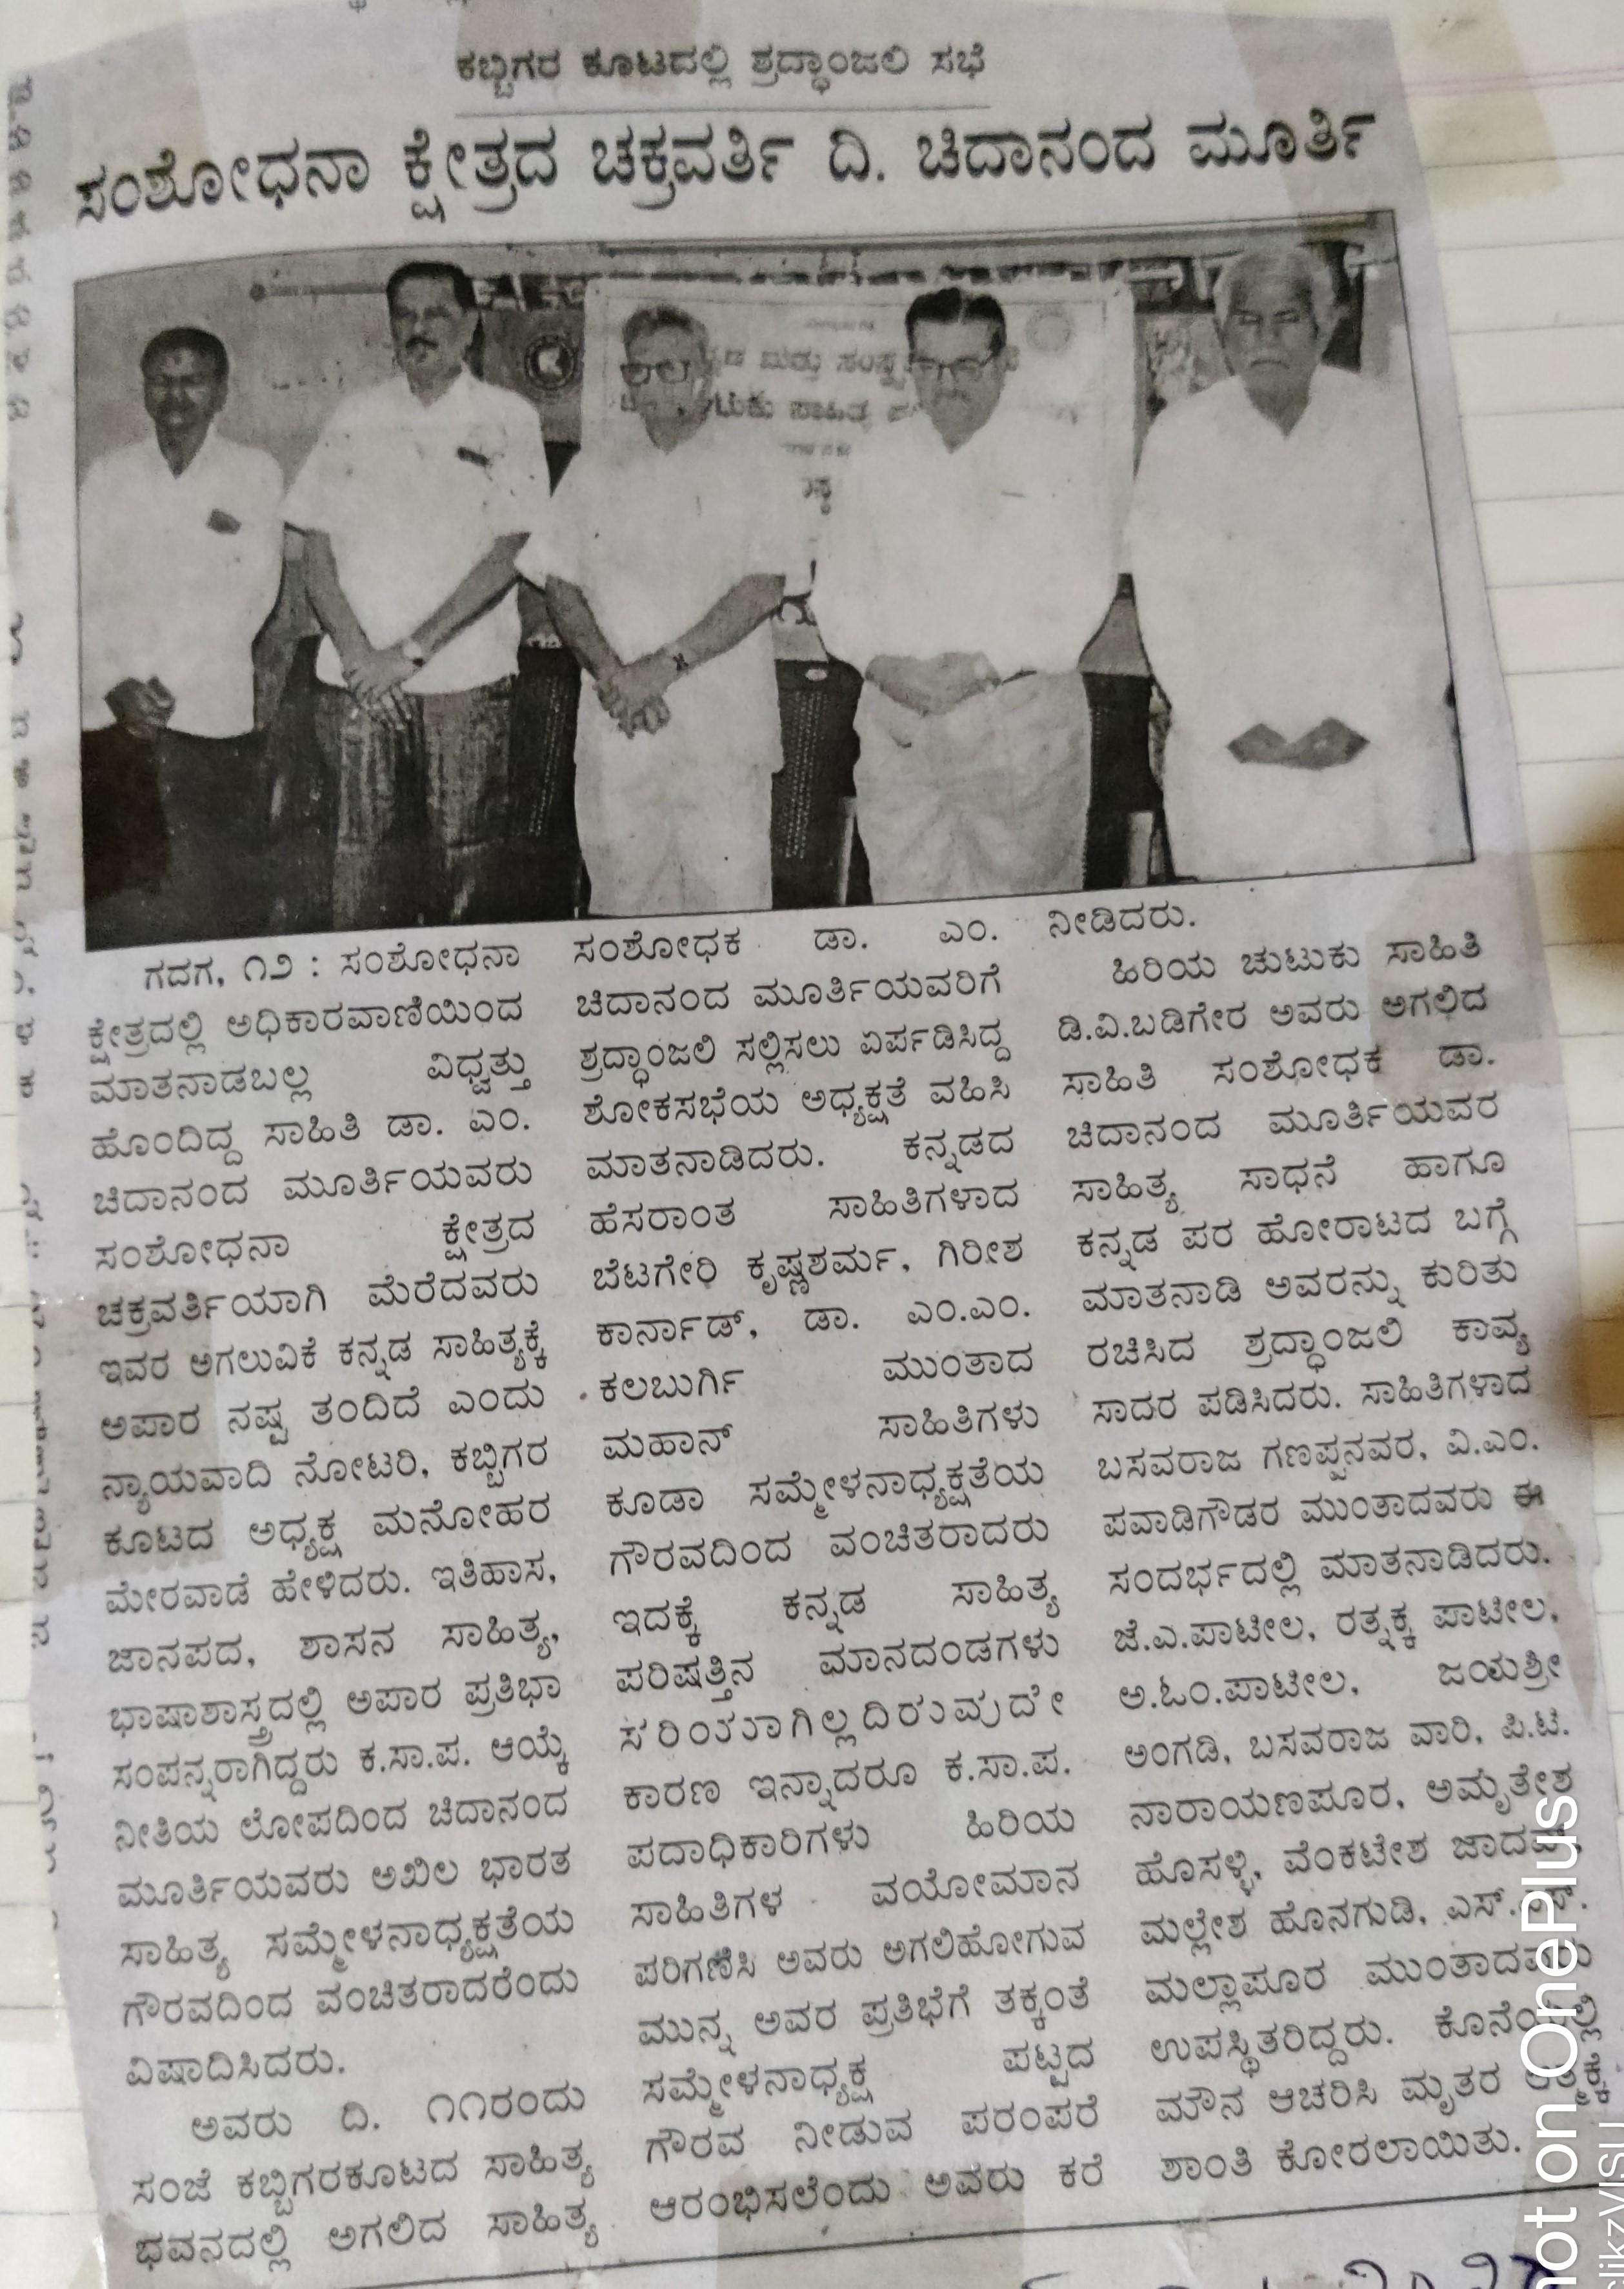 /media/akkkt/1NGO-00374-Akhila_Karnataka_Kabbigara_Koota_Trust_Gadag-Paper_Media_Coverage-4.jpg